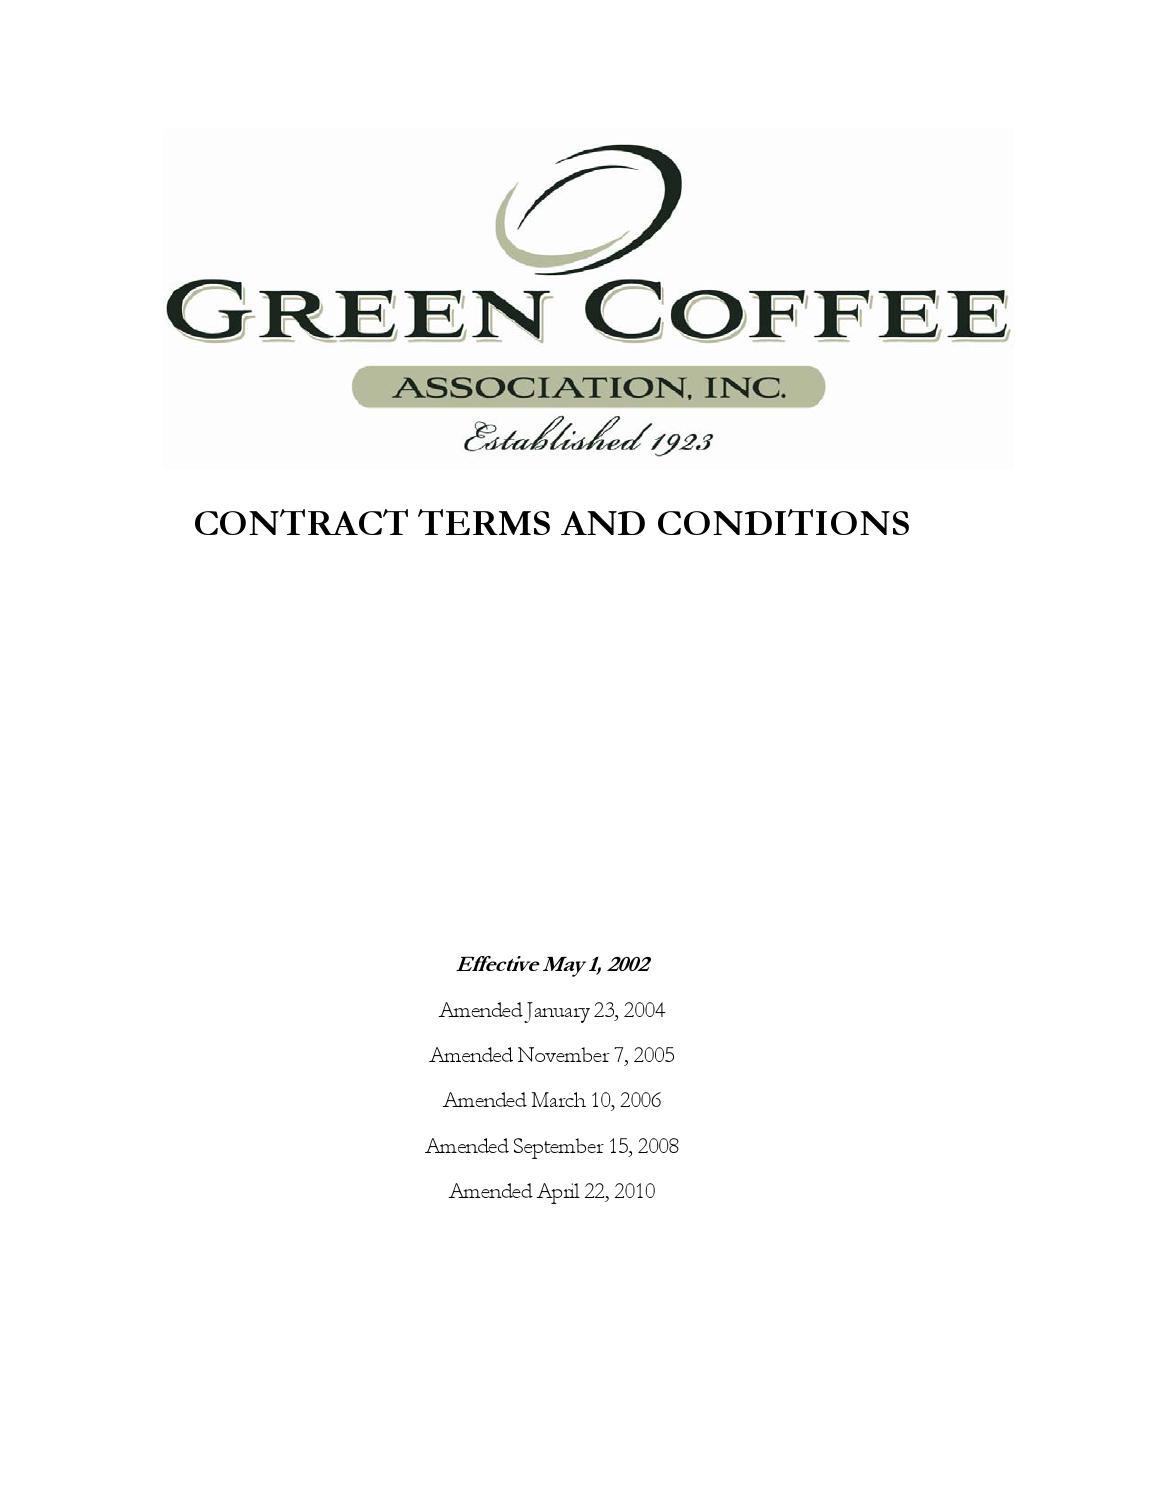 Green Coffee Association Contract 2010 by El Cafetalero - issuu